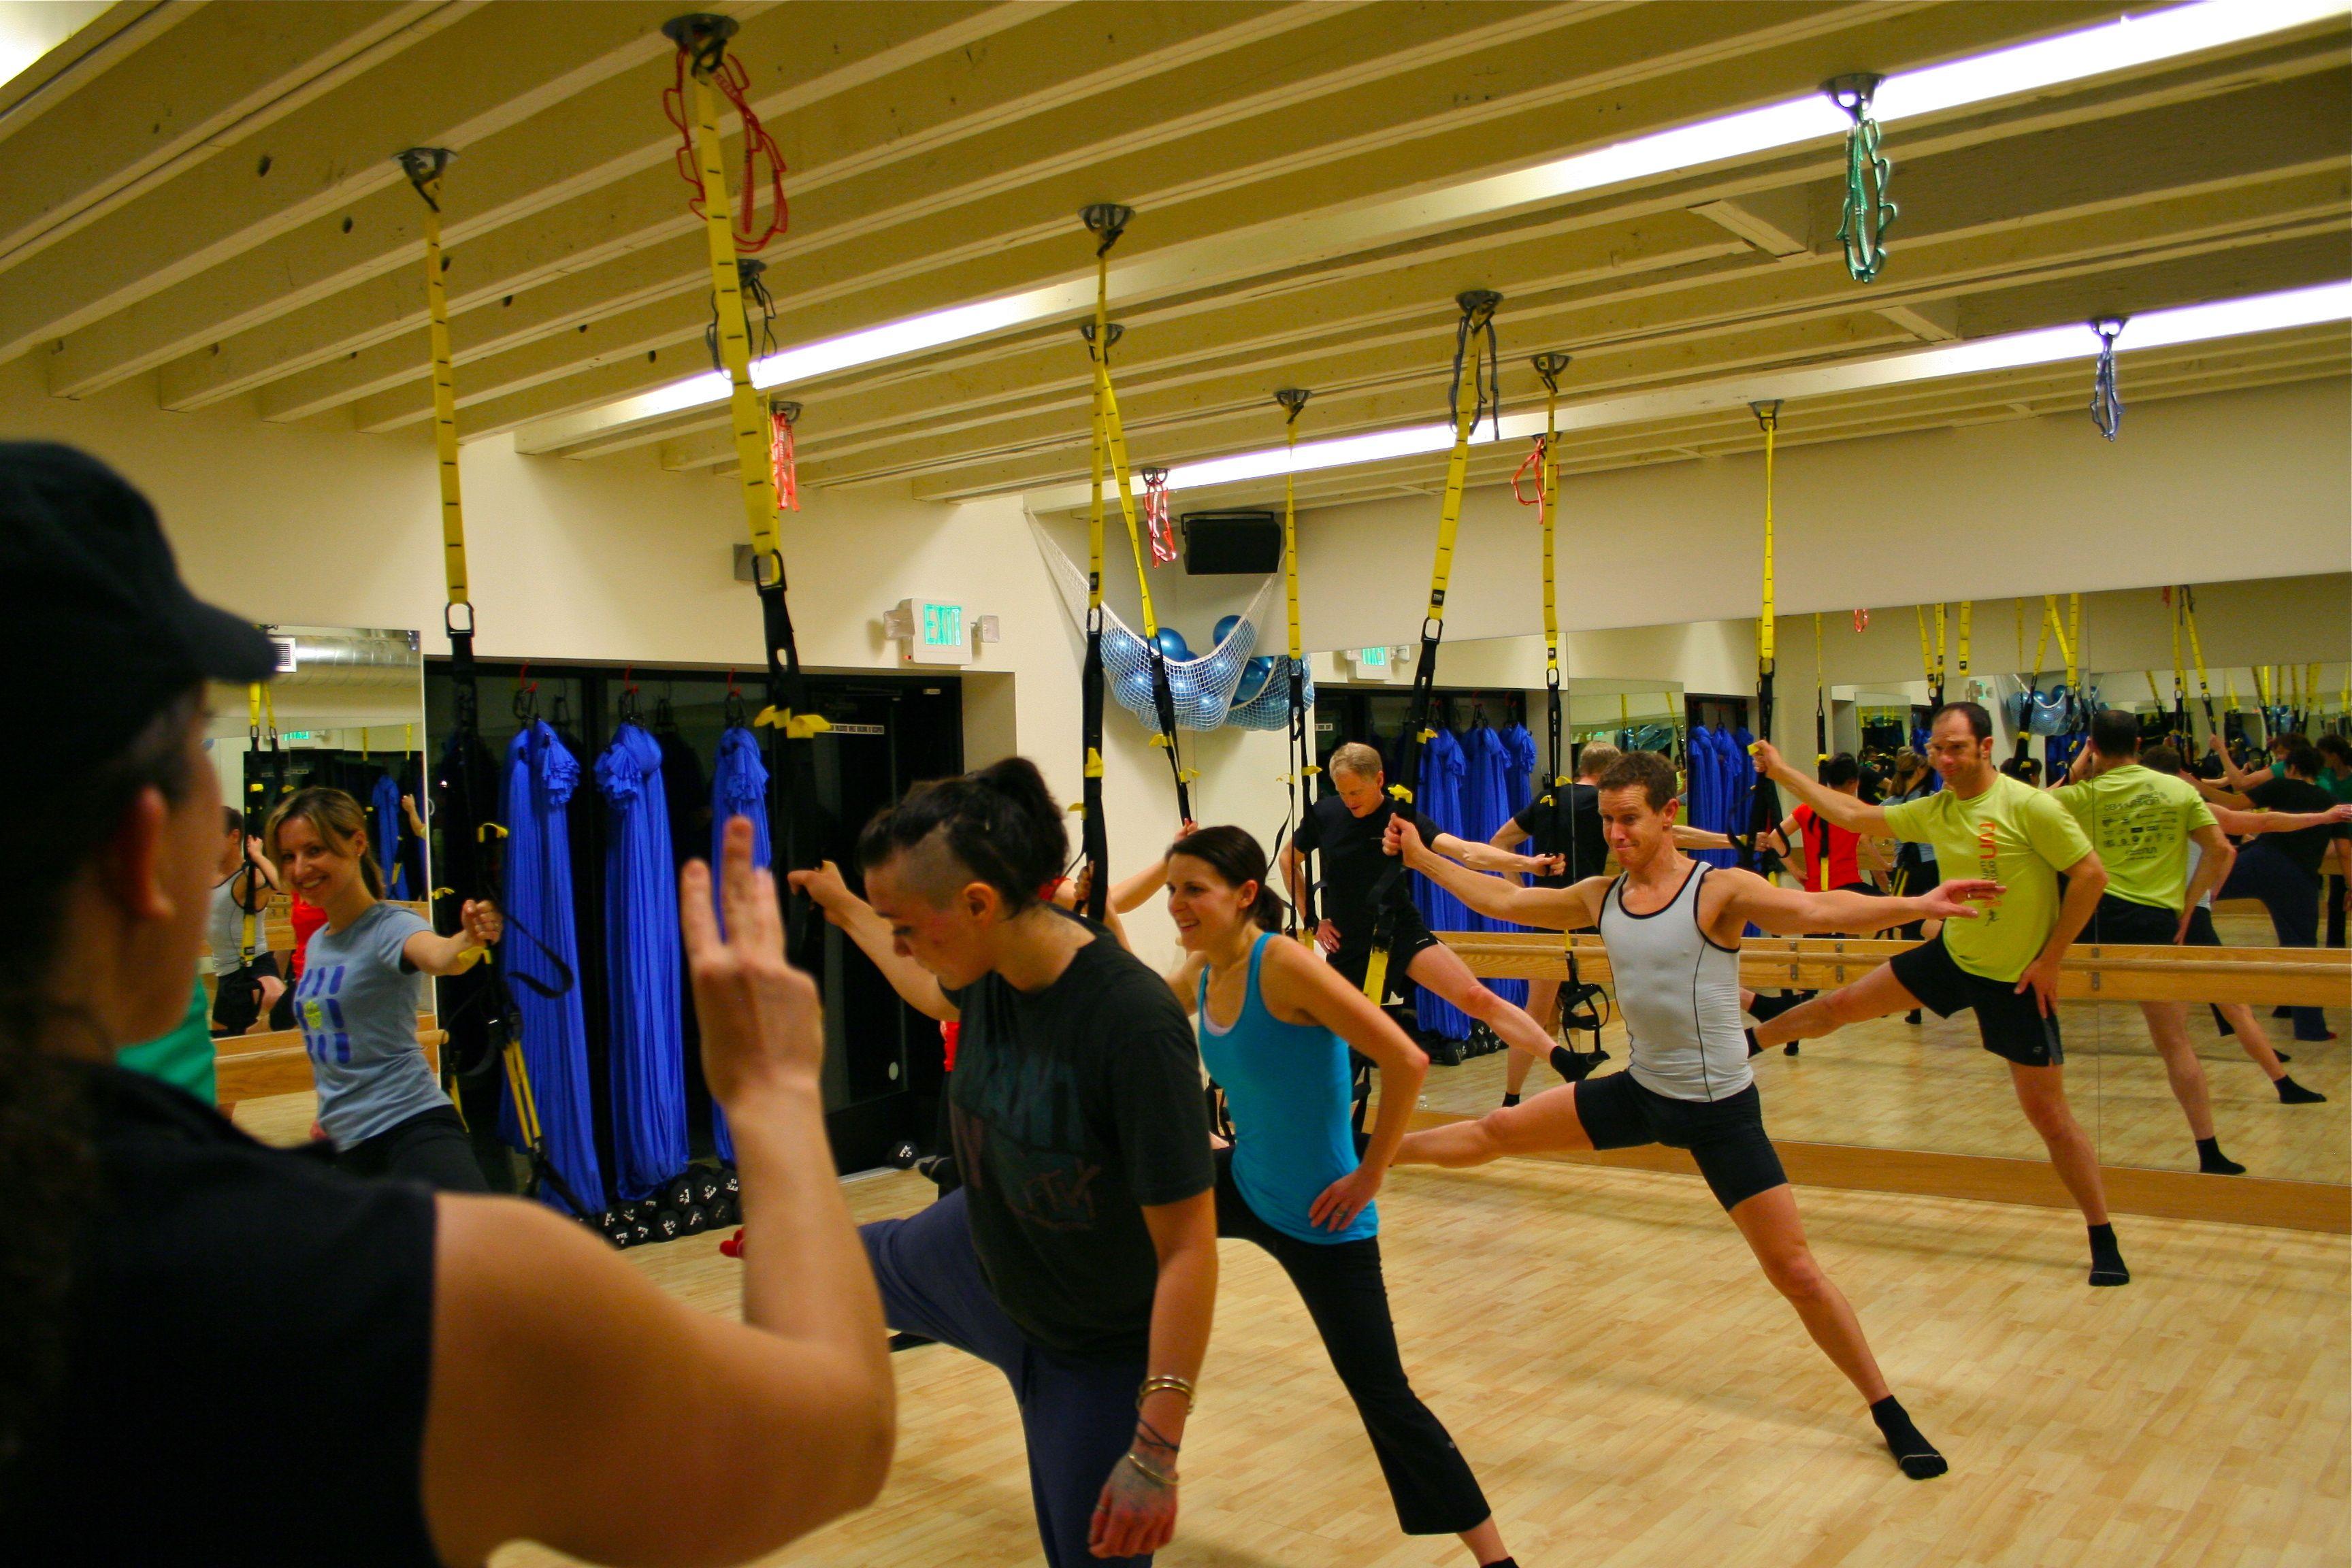 Back Studio Trx Barre Combination Class Tighten Those Glutes Tone Those Thighs Barre Workout Trx Pilates Studio